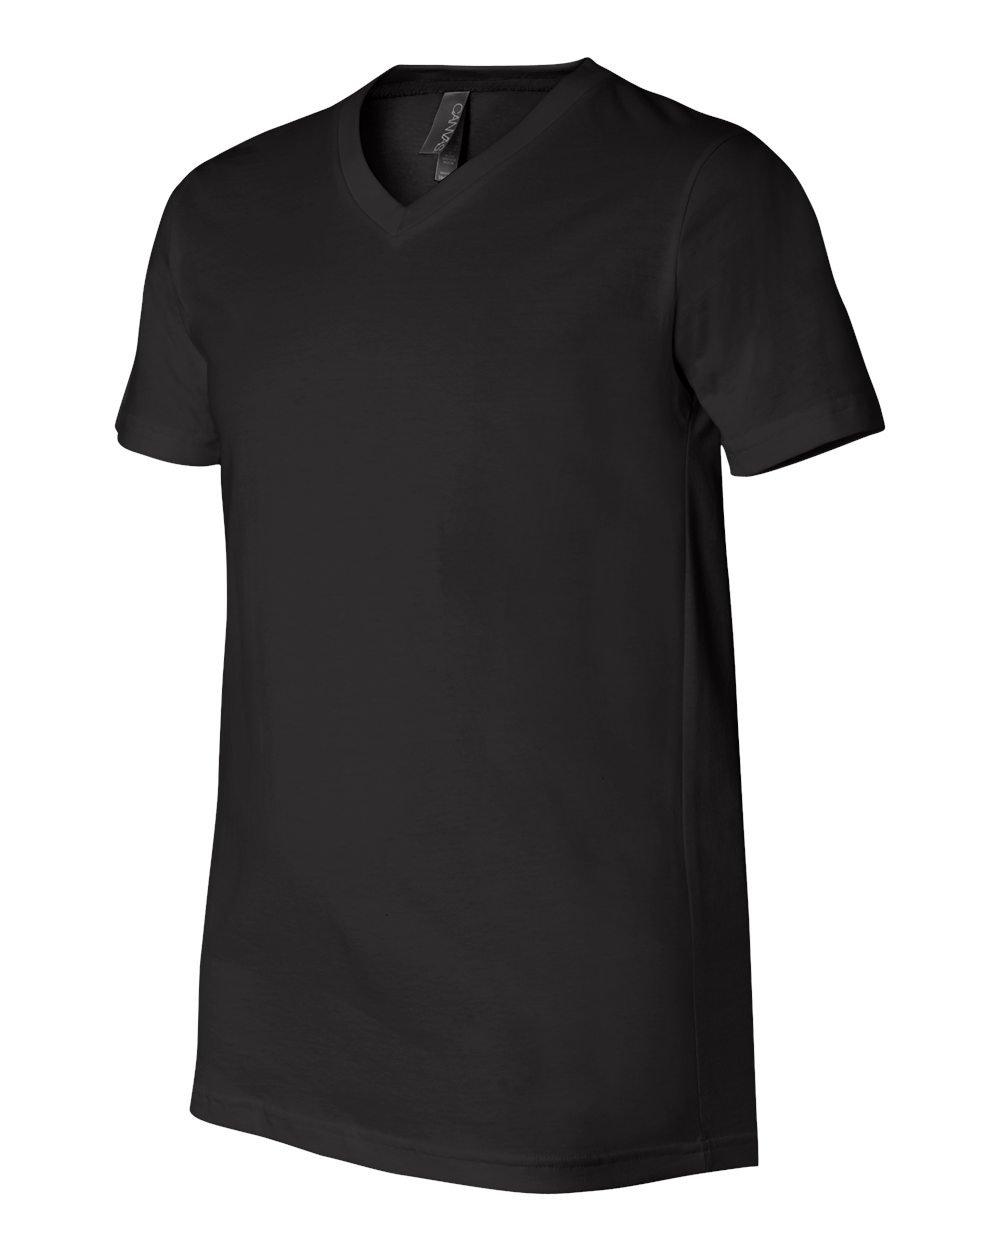 Bella And Canvas Unisex Short Sleeve V Neck Jersey T Shirt